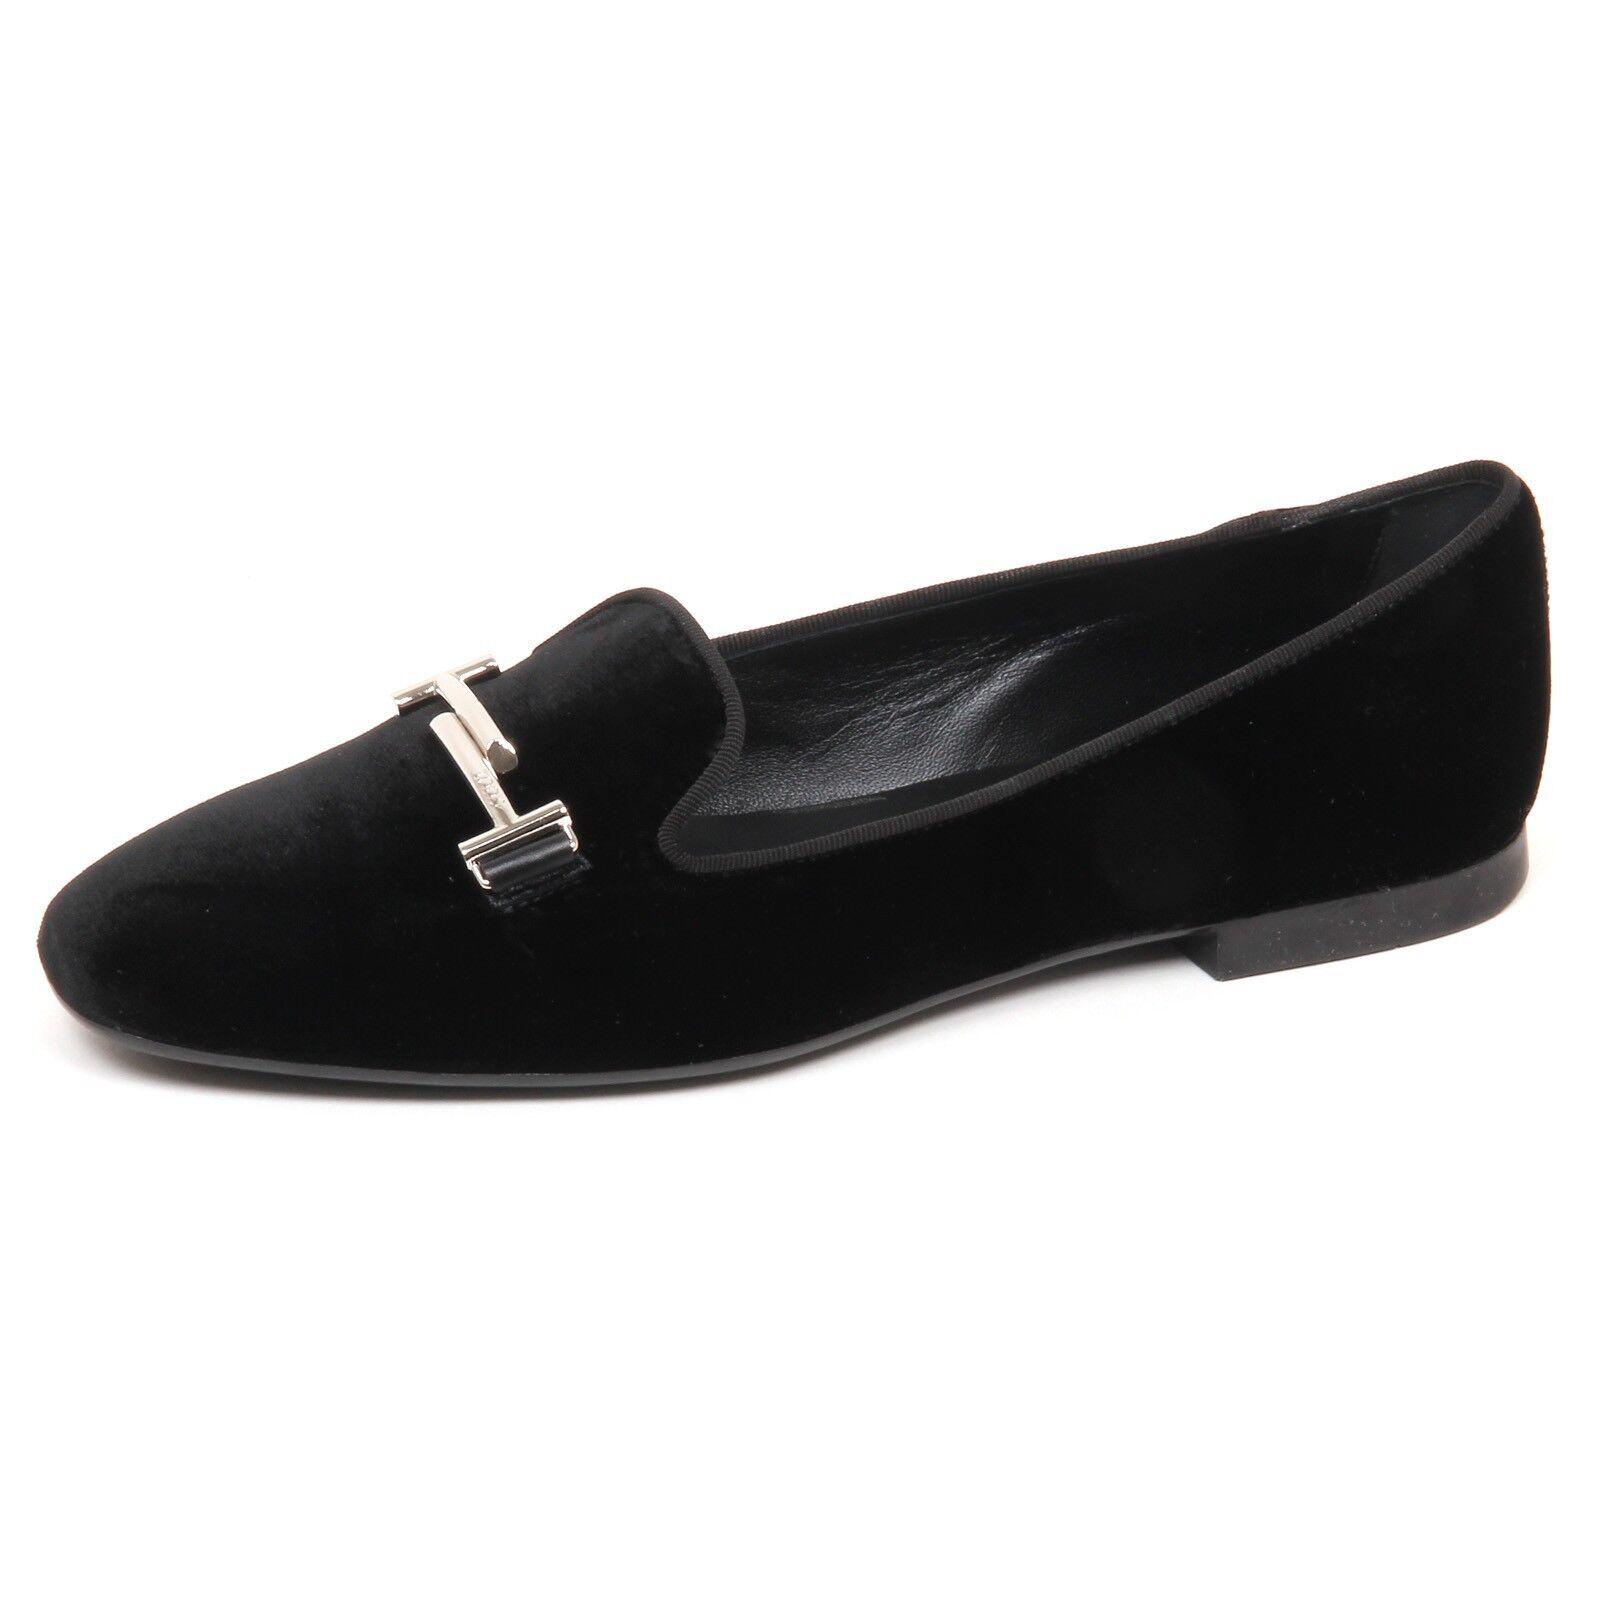 E2822 bailarina mujer mujer mujer Velvet Tod's zapatos negro velluto zapatos Woman  ventas al por mayor